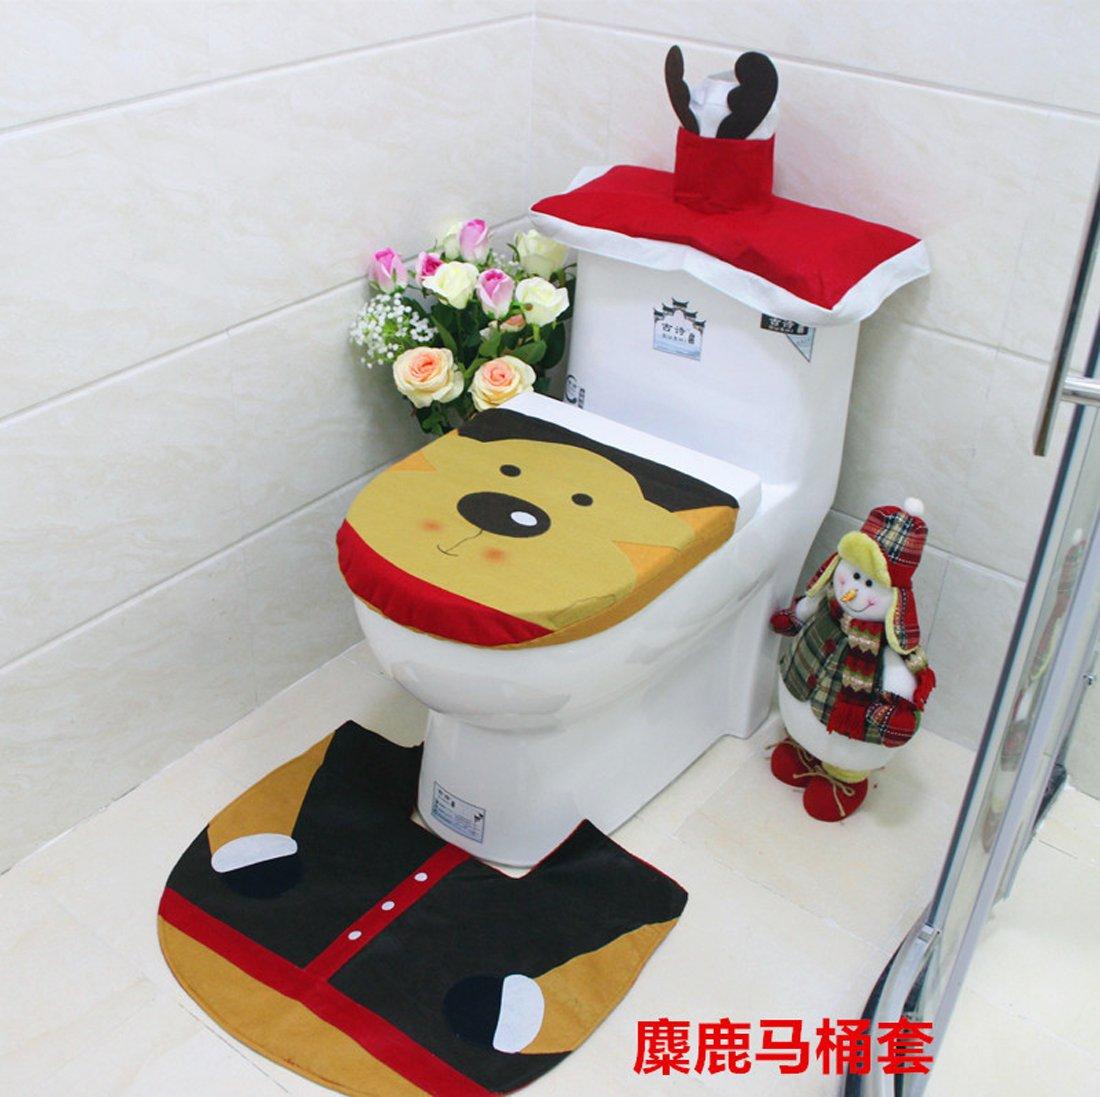 Christmas Decorations Snowman Santa Elk Genius Toilet Seat Cover and Rug Set for Bathroom By Hi Suyi NingboshuyioutdoorproductsCo.Ltd